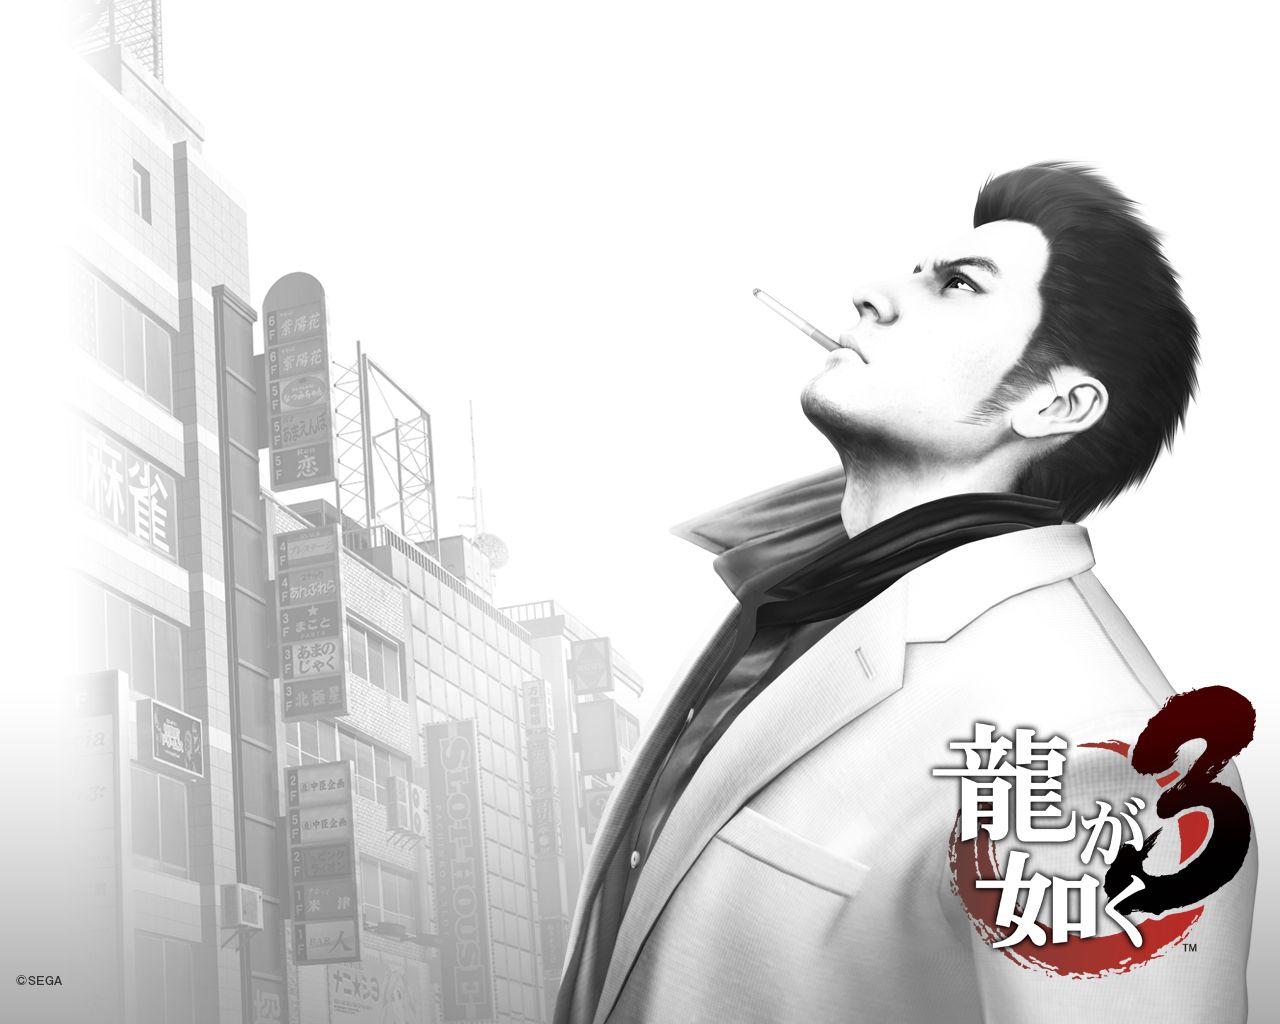 Yakuza 3 Wallpapers   Top Yakuza 3 Backgrounds   WallpaperAccess 1280x1024